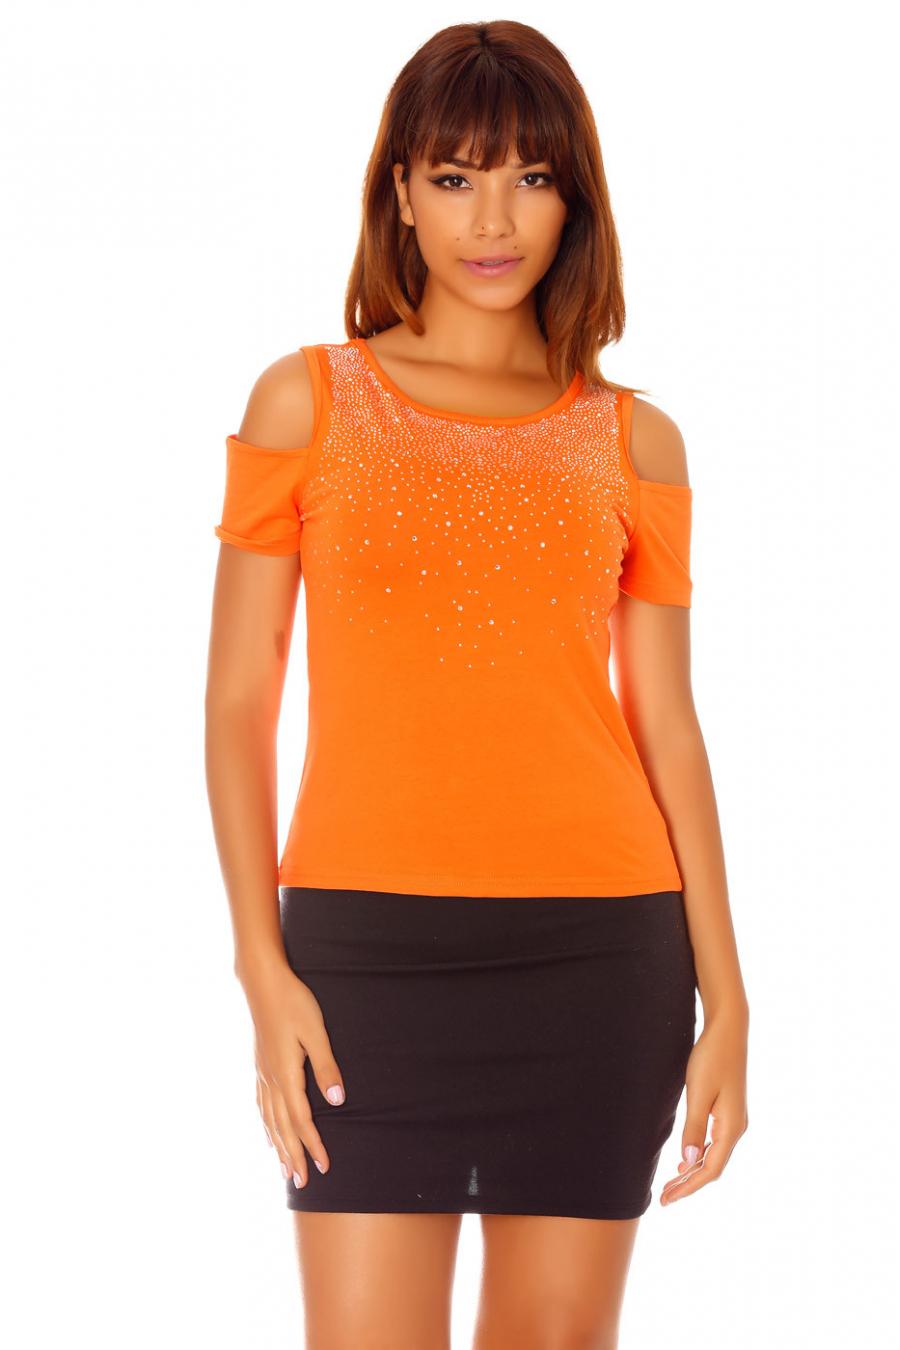 Orange rhinestone top with bare shoulders. F227